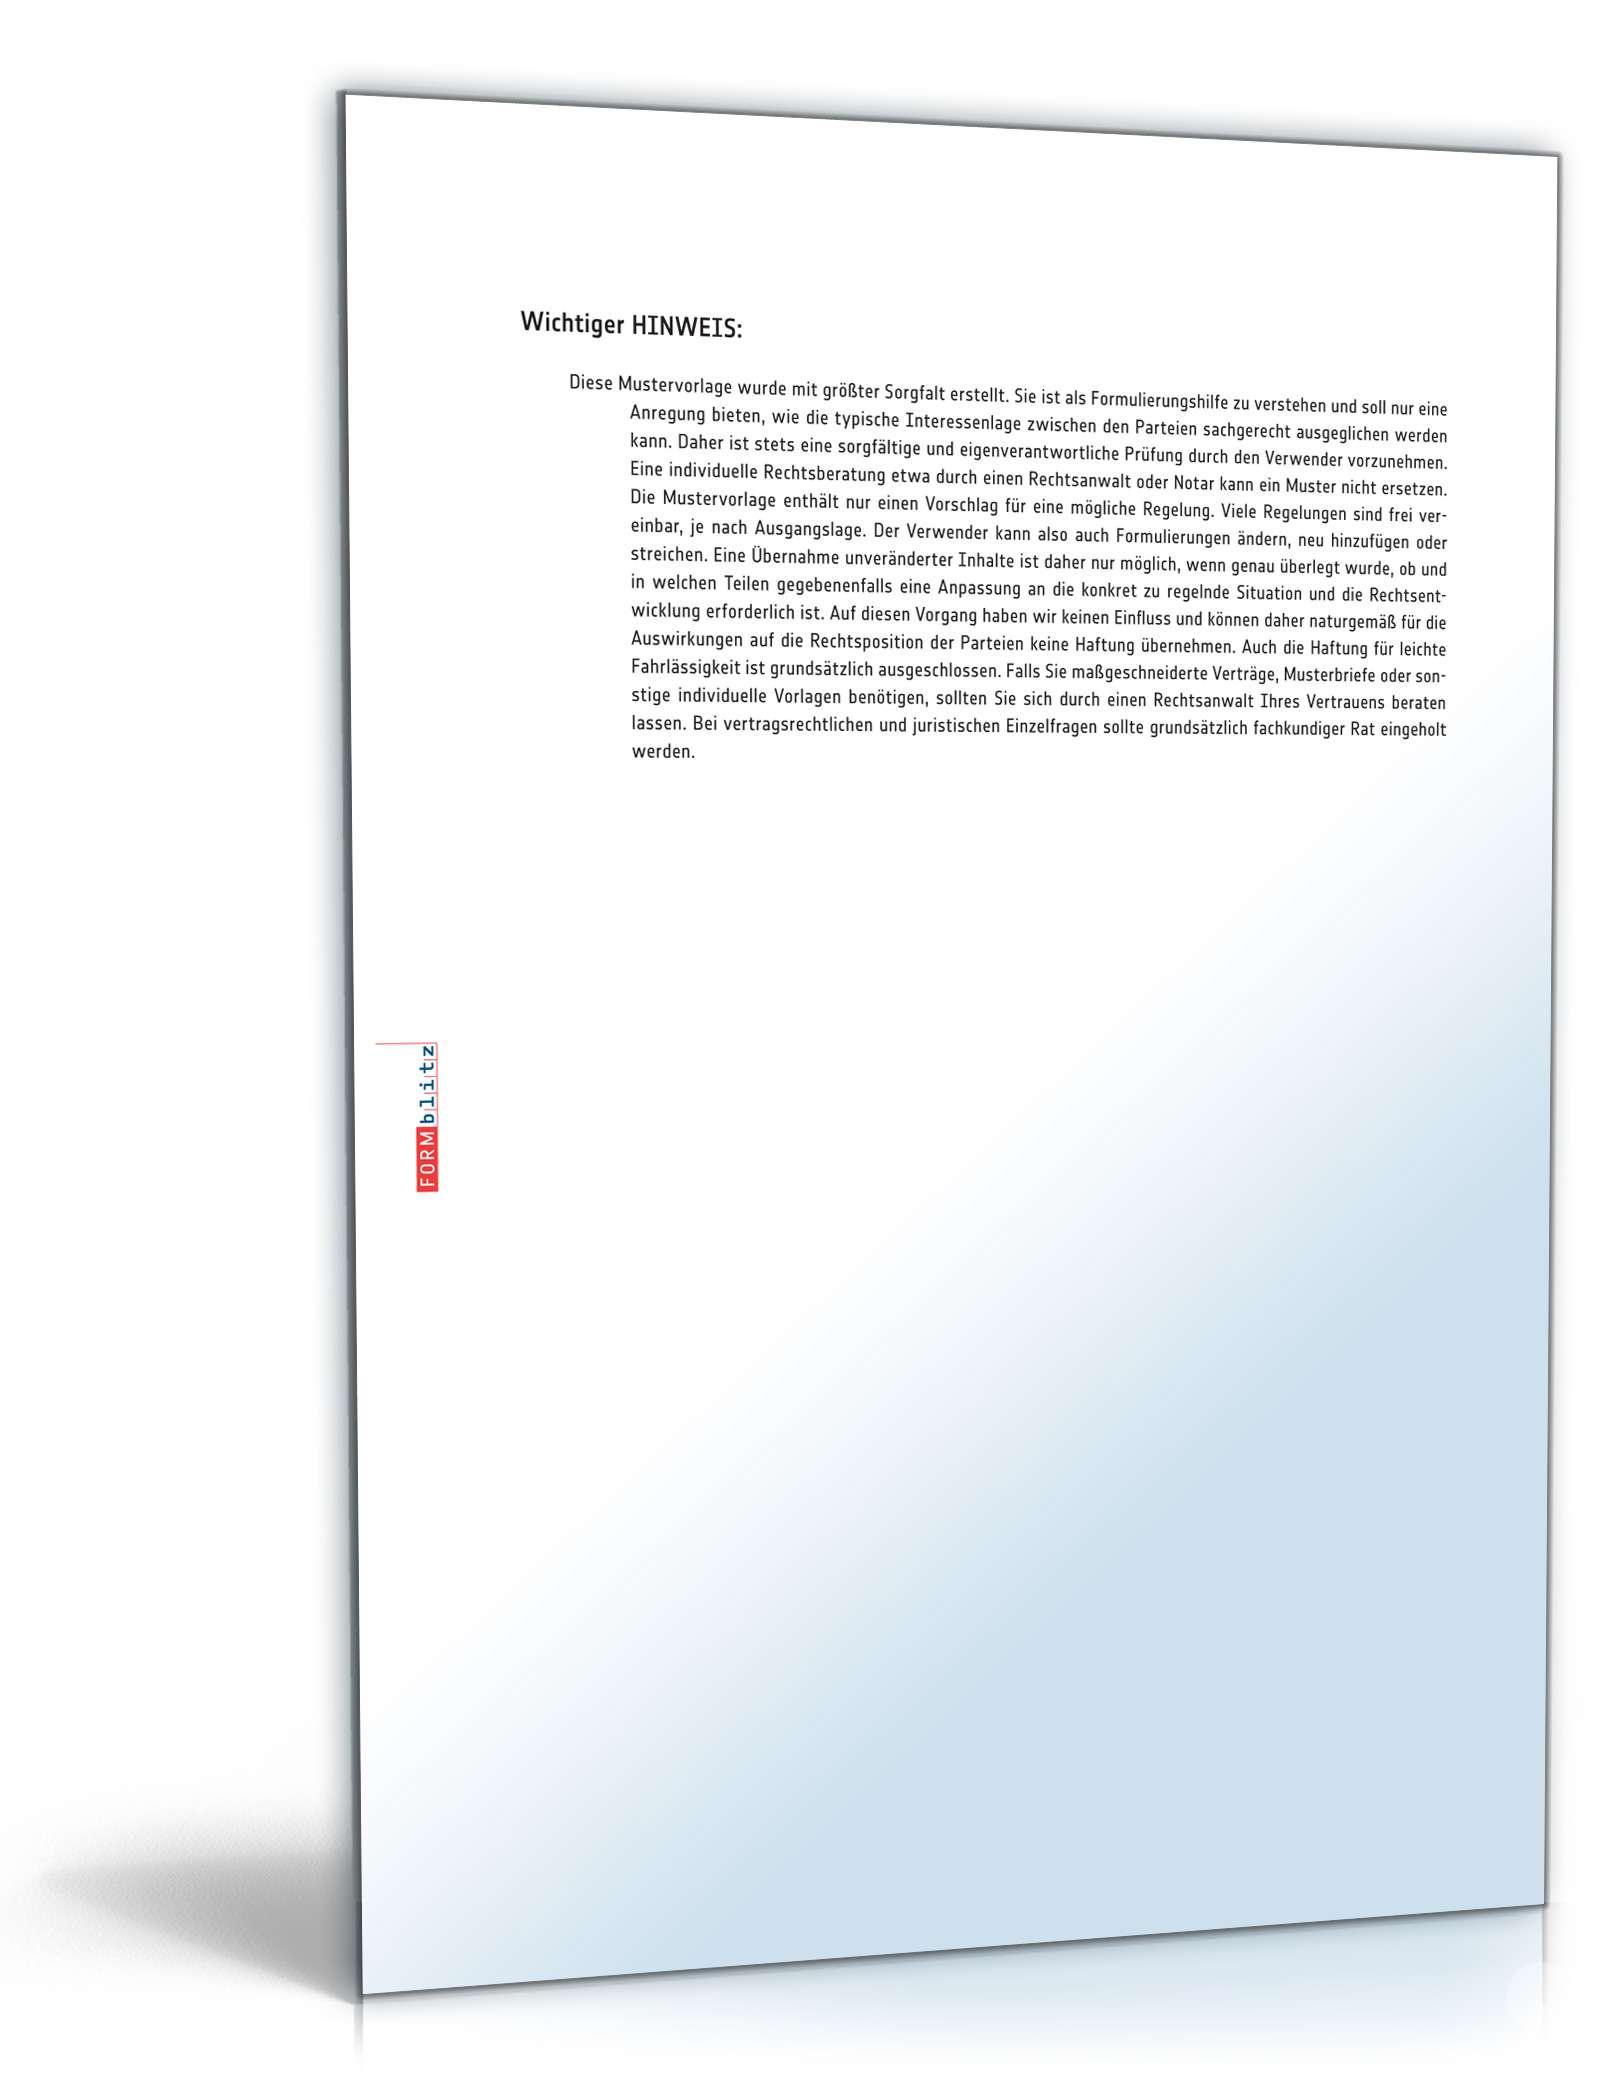 generalvollmacht muster als pdf doc zum download. Black Bedroom Furniture Sets. Home Design Ideas